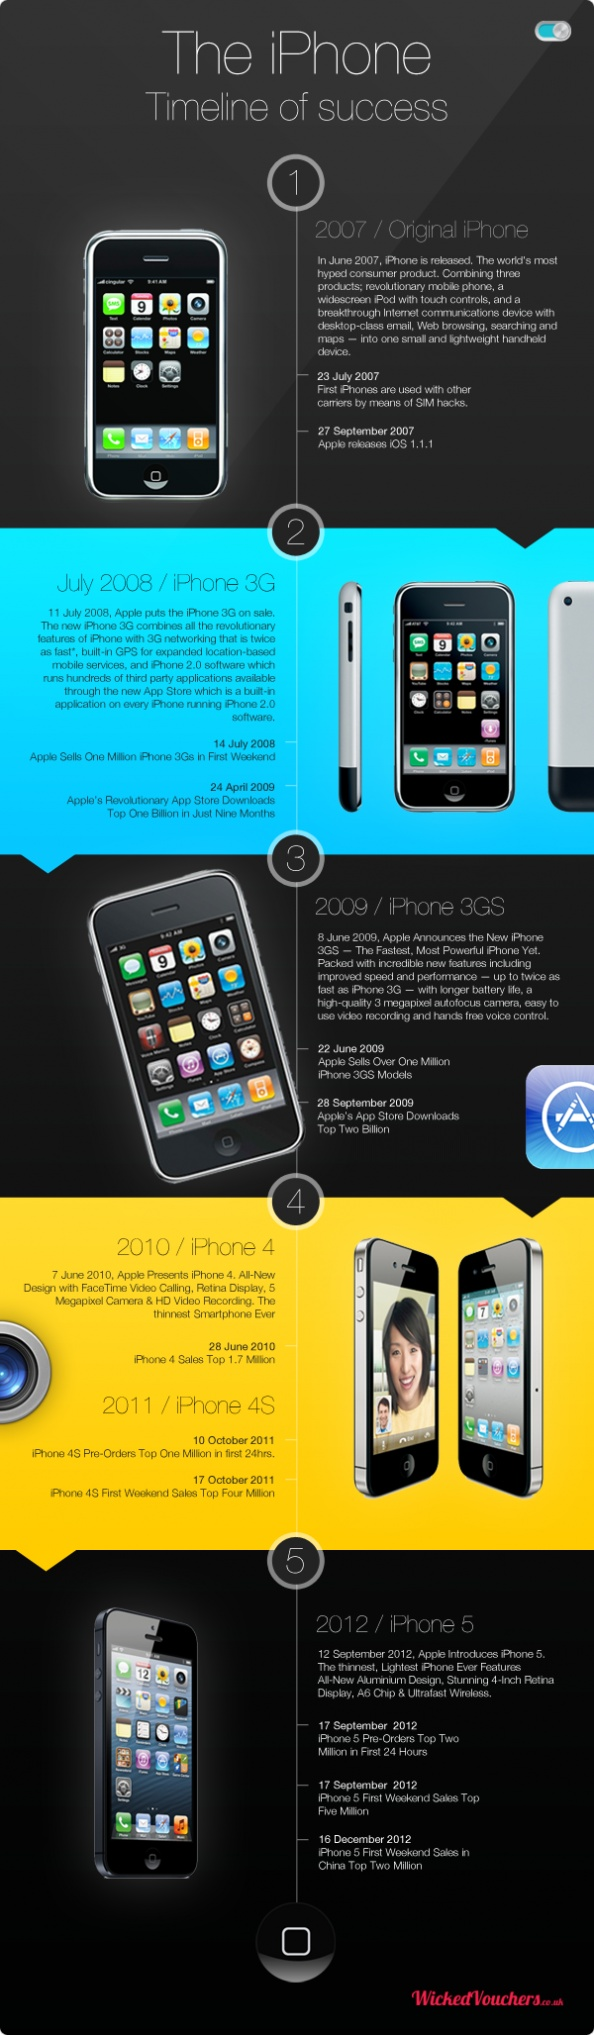 History of iPone